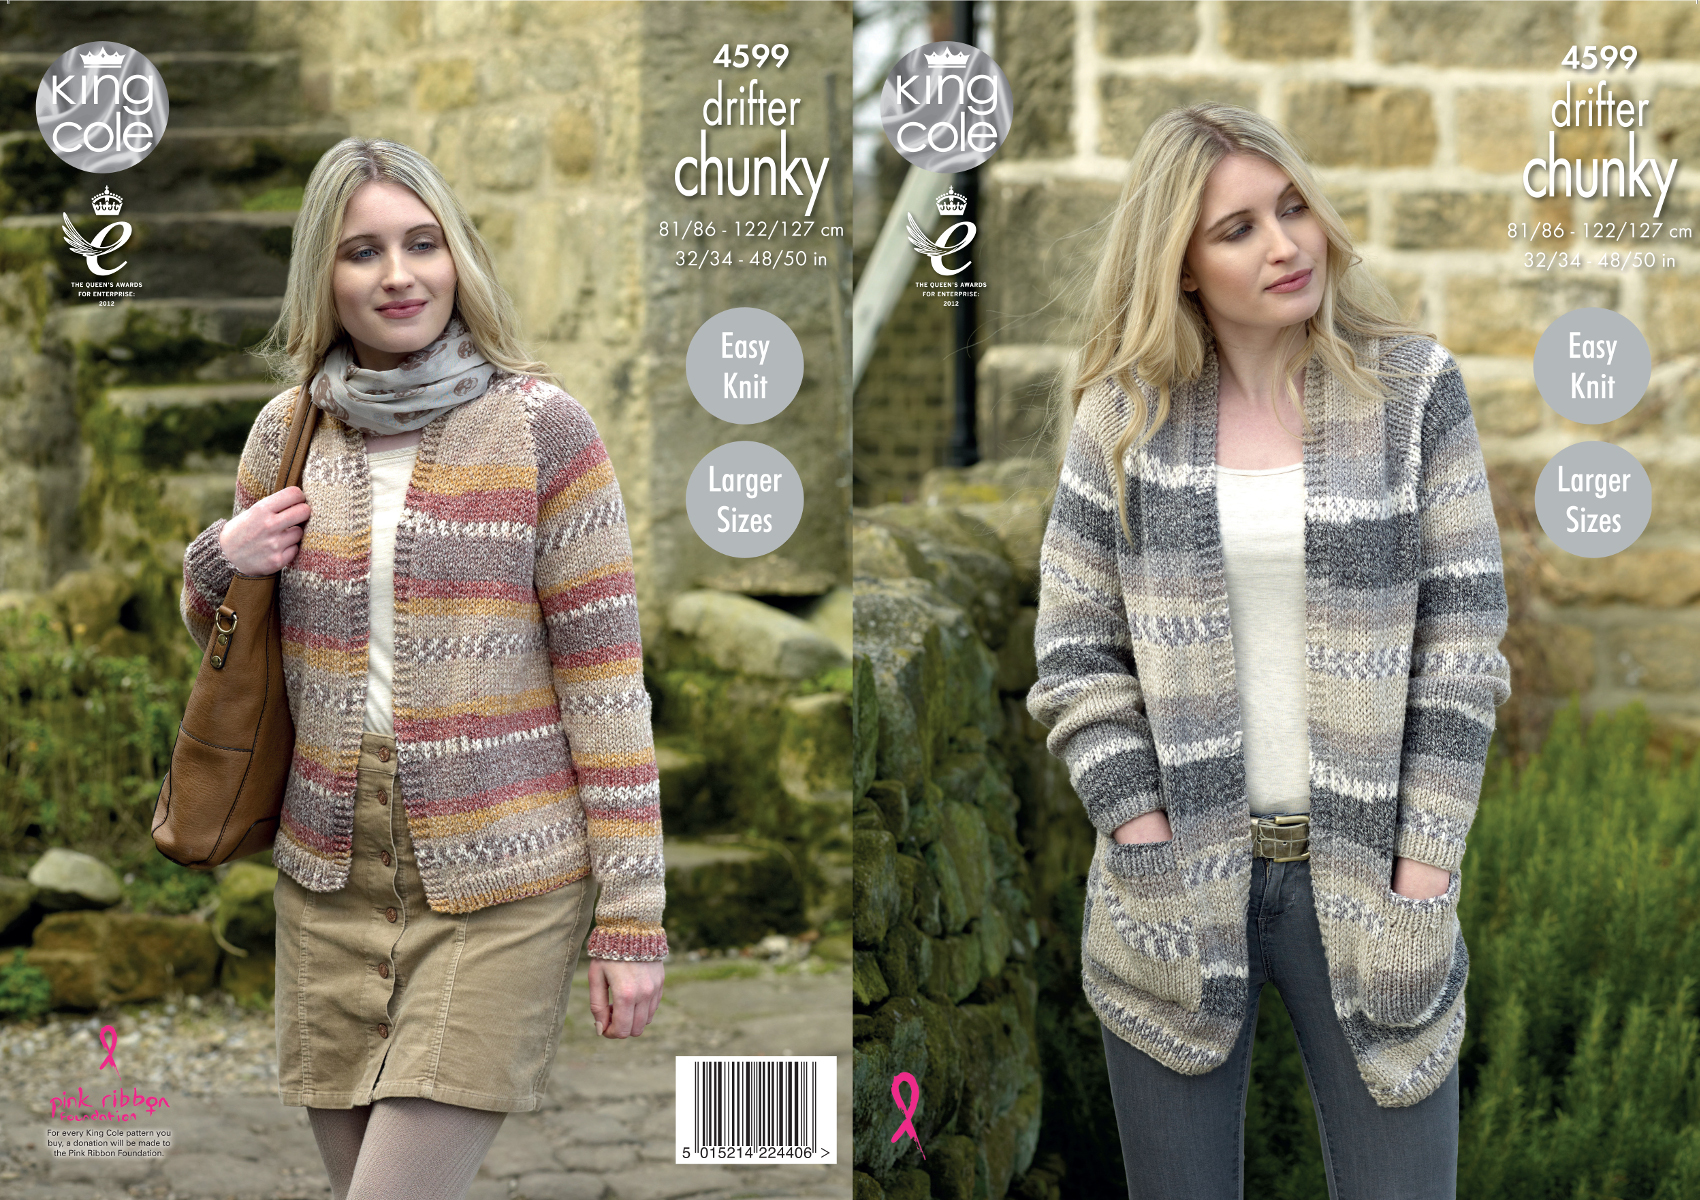 King Cole Ladies Cardigan Knitting Pattern : Easy Knit Long or Short Cardigans Ladies Chunky Knitting Pattern King Cole 45...